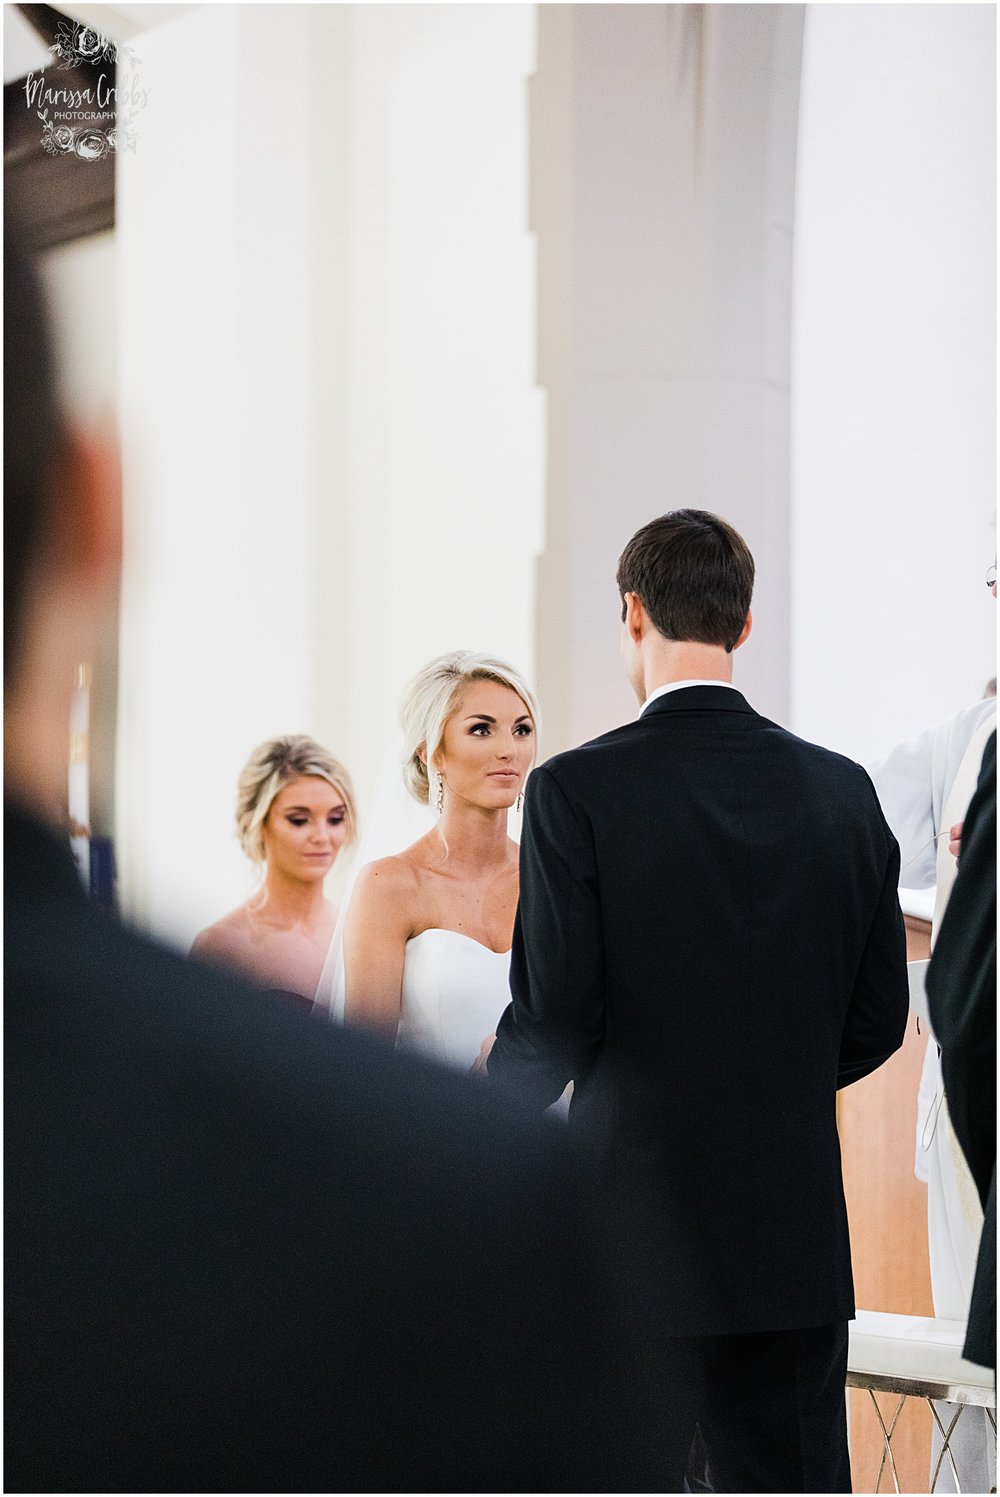 NOLL WEDDING | THE BRASS ON BALTIMORE | MARISSA CRIBBS PHOTOGRAPHY_6284.jpg